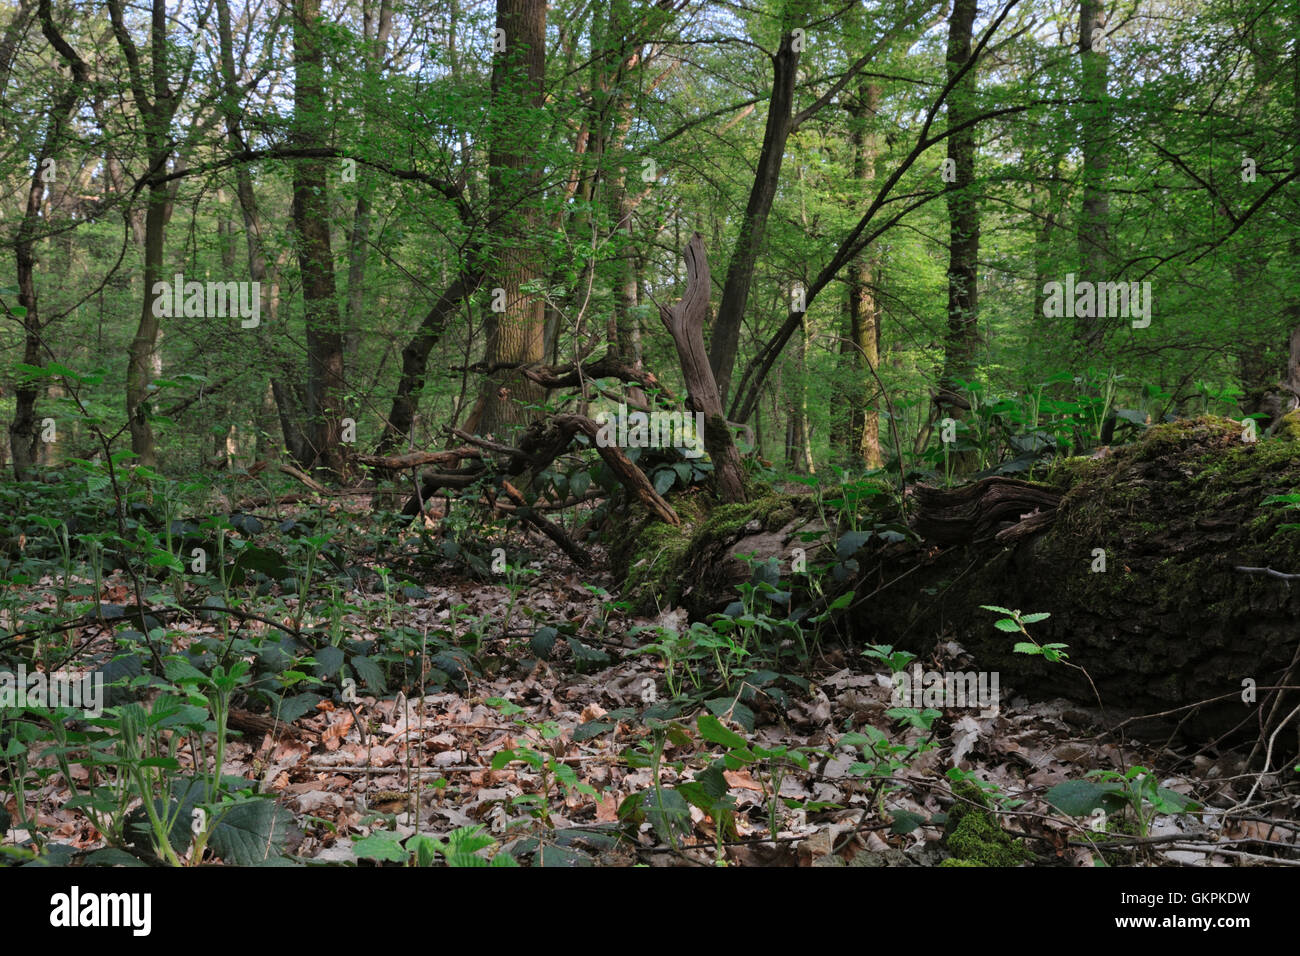 Old fallen rotten tree laying in a Natural forest / Naturwaldzelle / Urspruenglicher Laubwald. Stock Photo